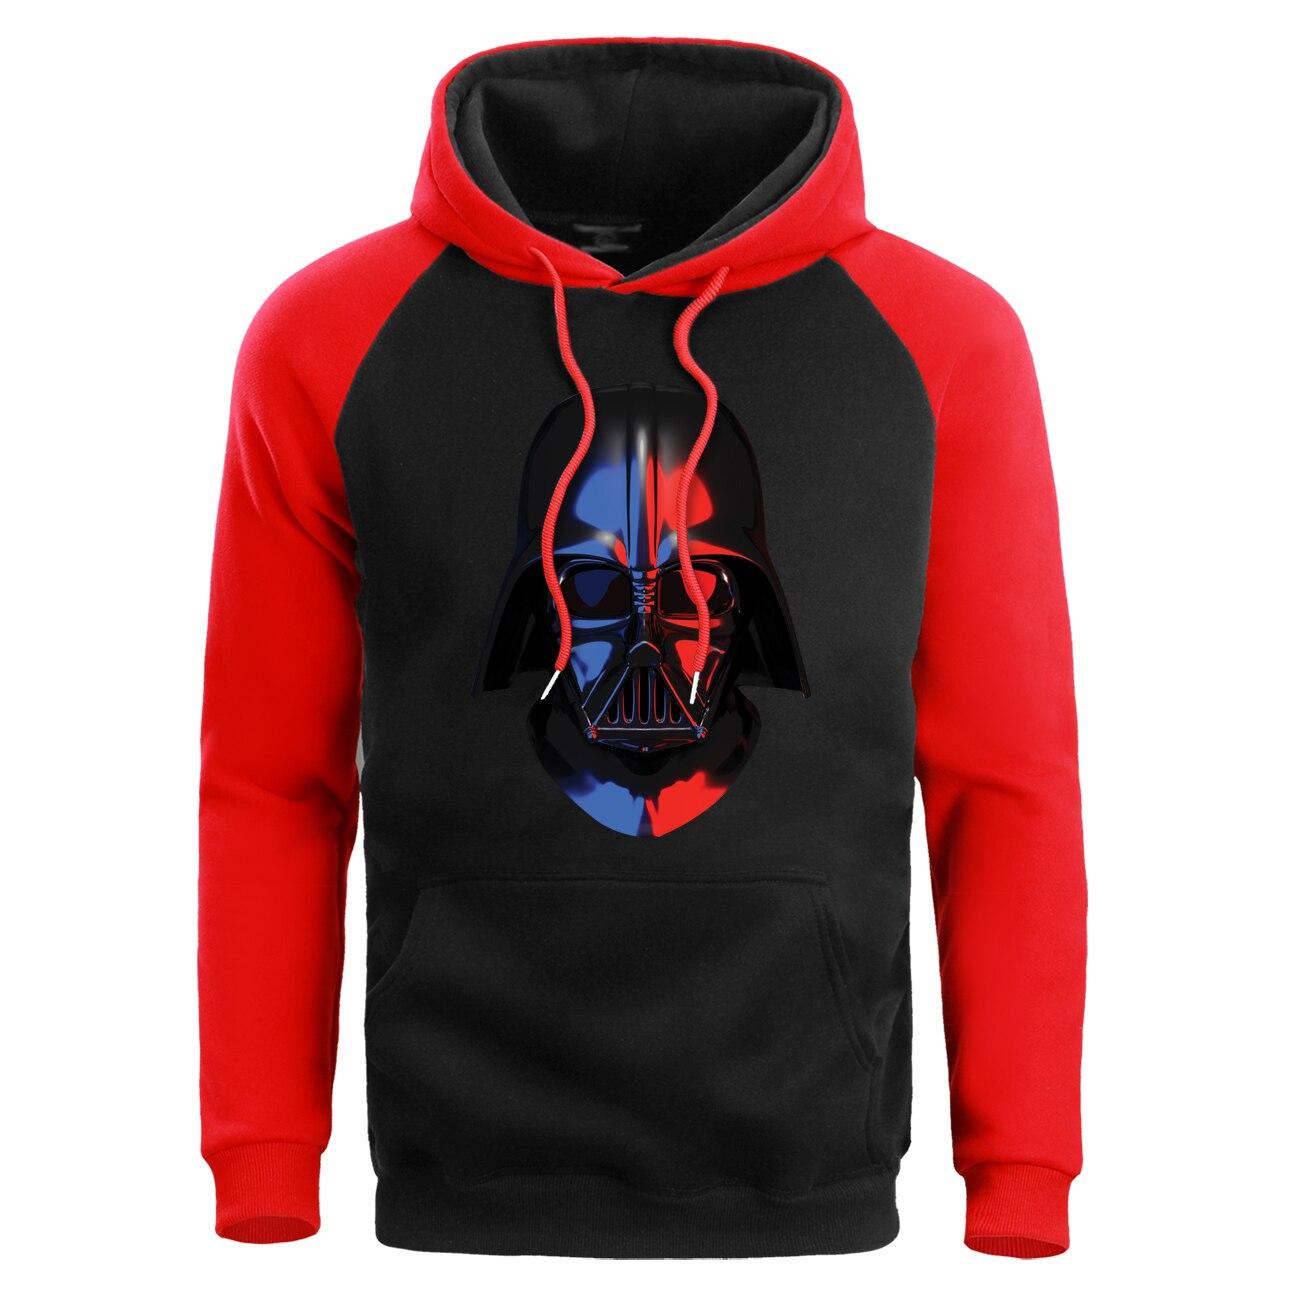 2019 Autumn Winter Mens Star Wars Hoodies Fashion Darth Vader Sportswear Hooded Hoodie Hip Hop Casual Pullover Hoody Long Sleeve